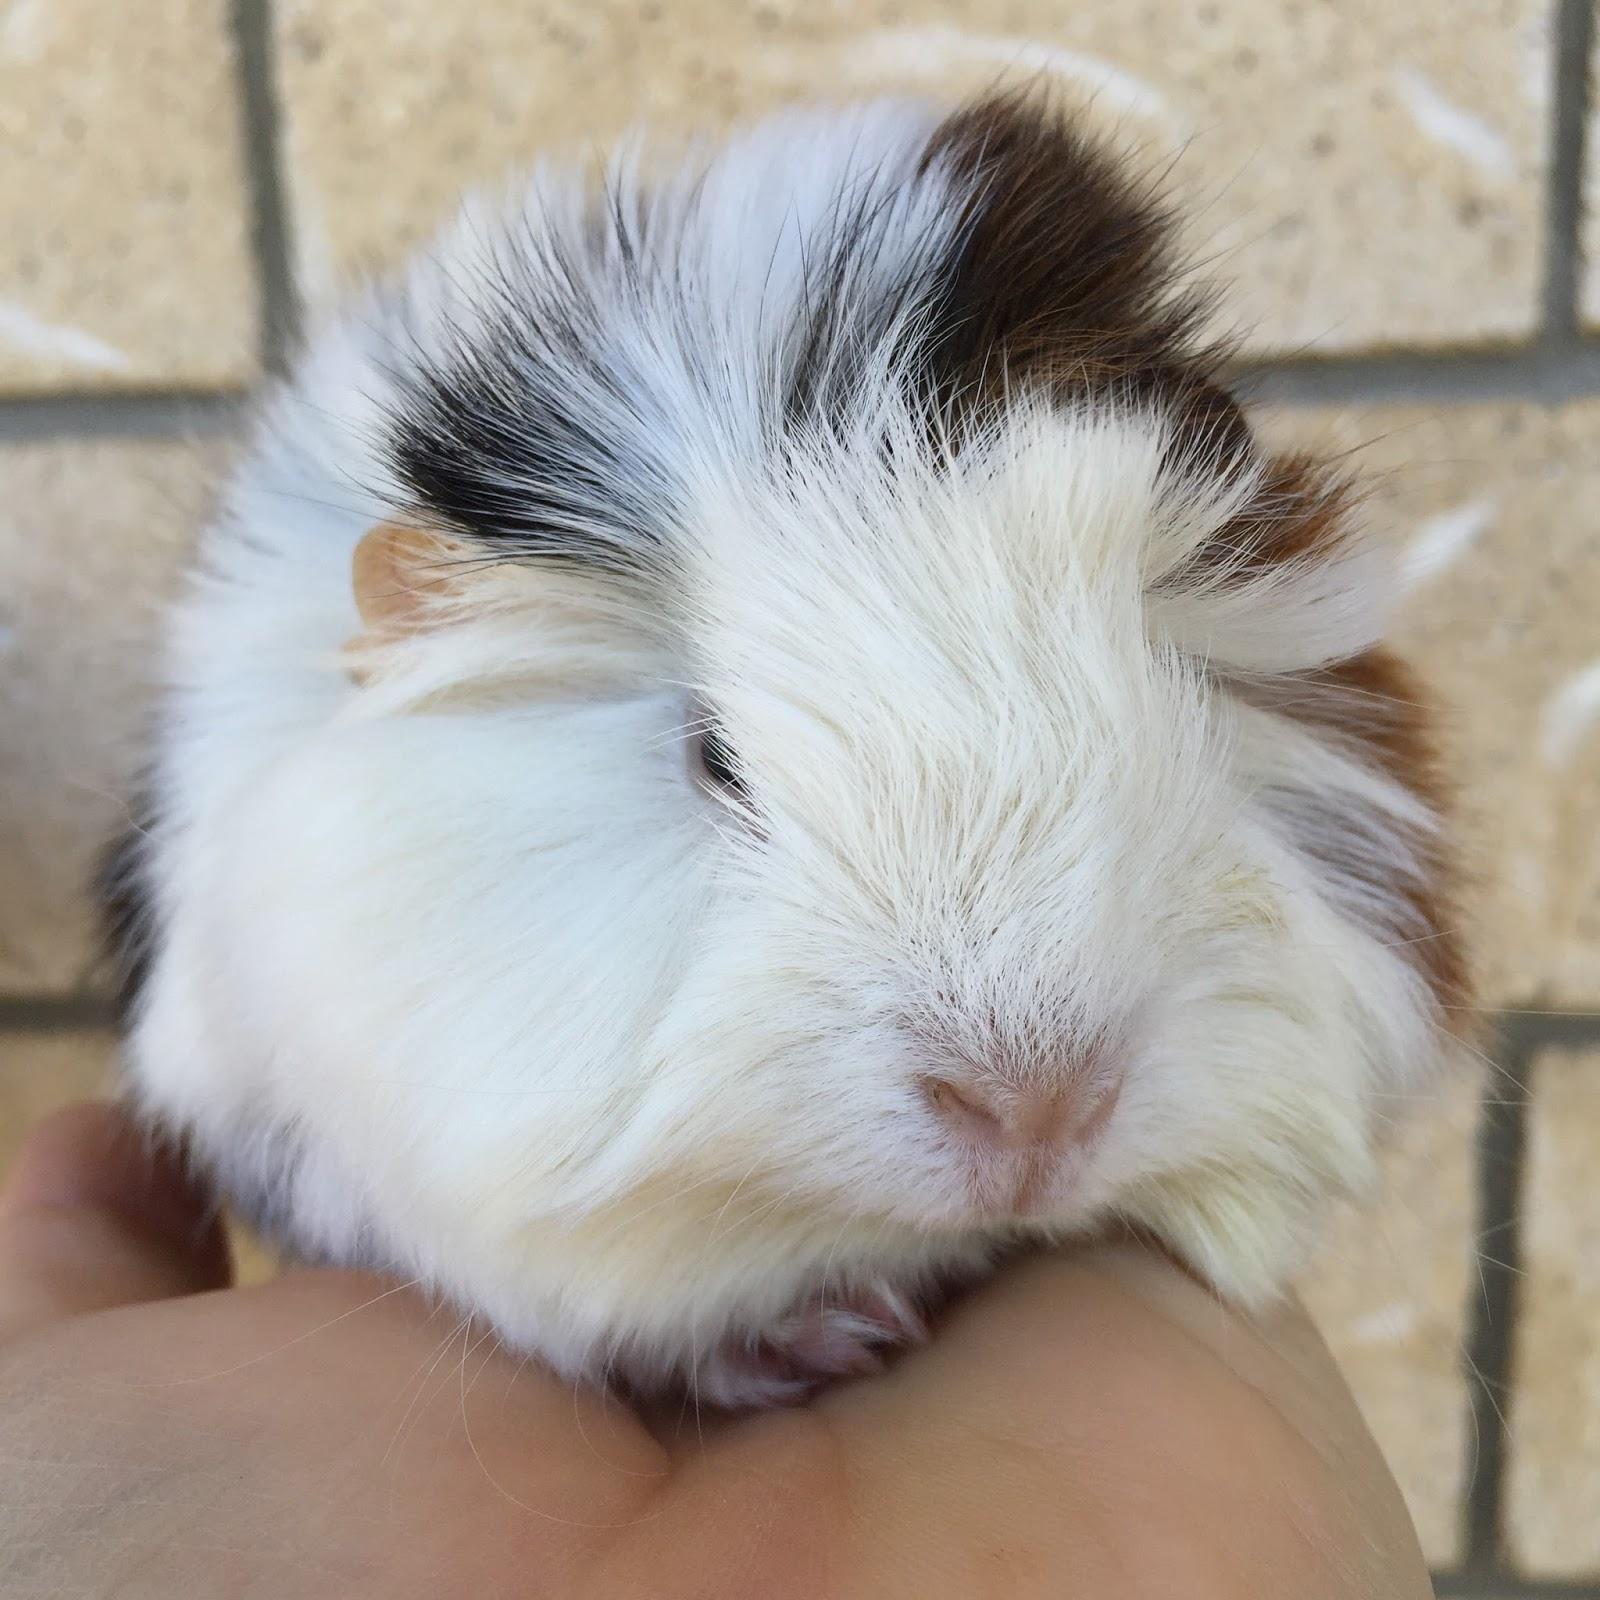 All Things Guinea Pig: Peruvian baby boy